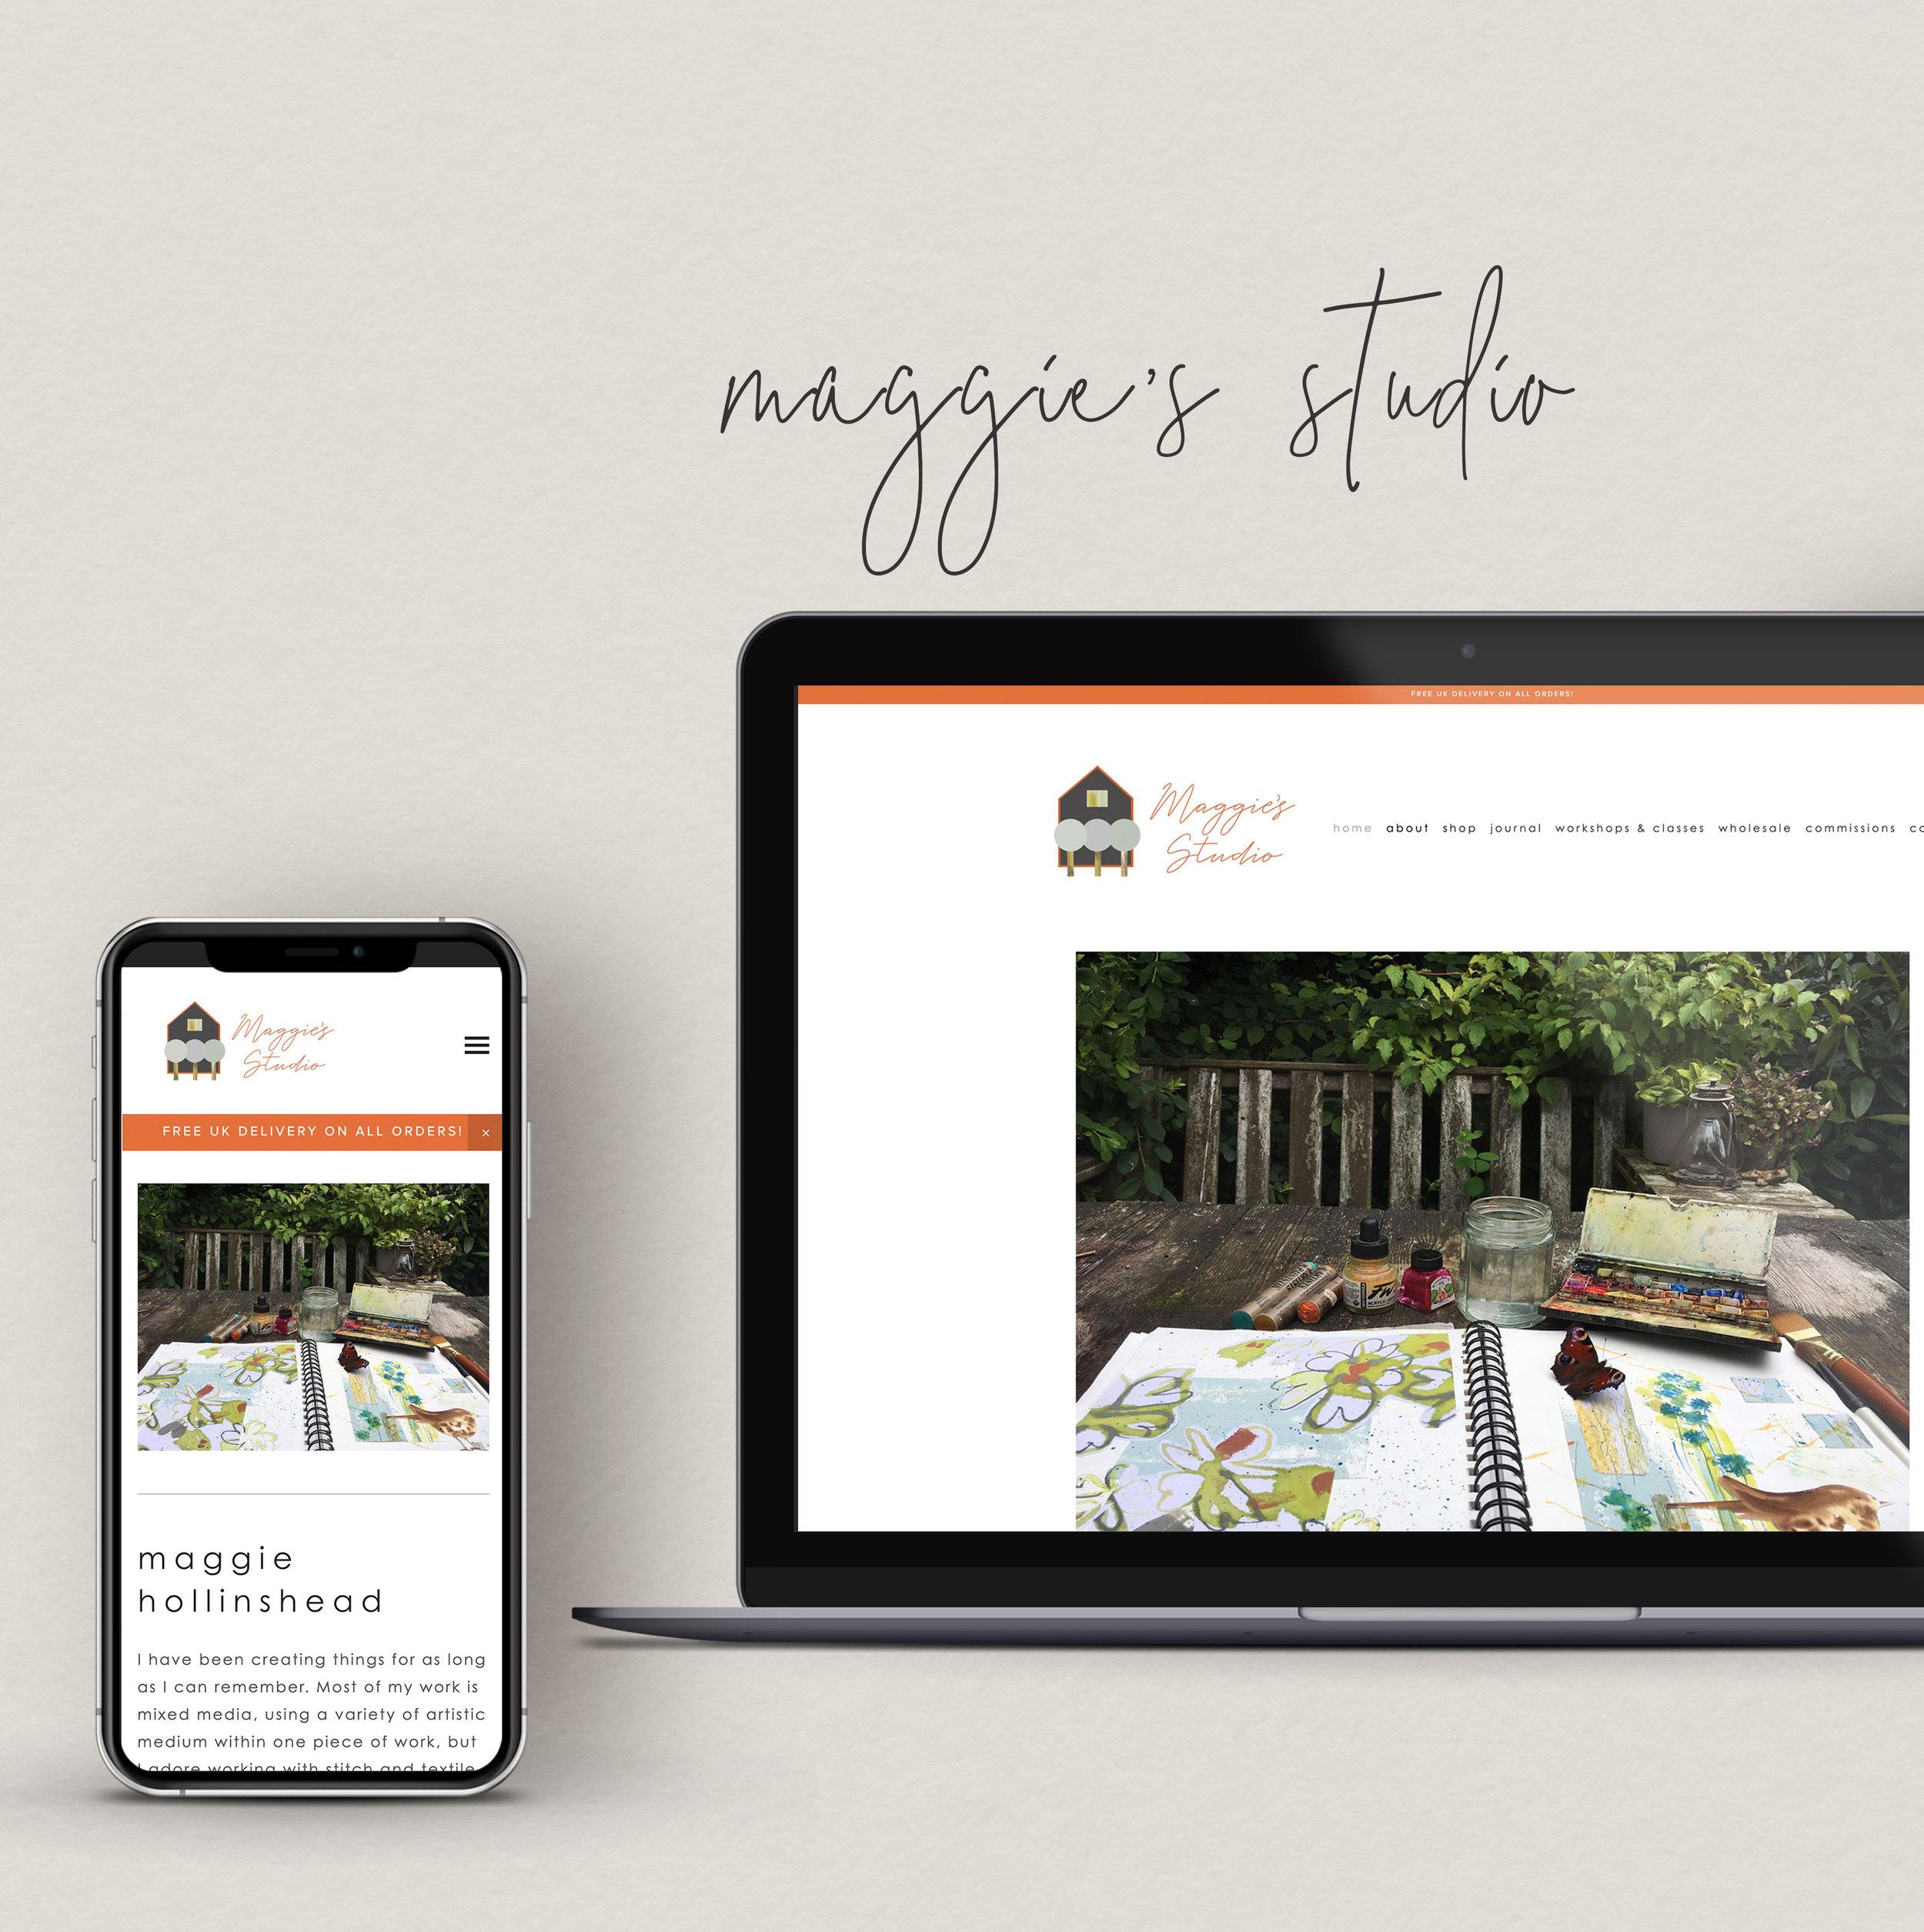 Maggies Studio Instagram.jpg